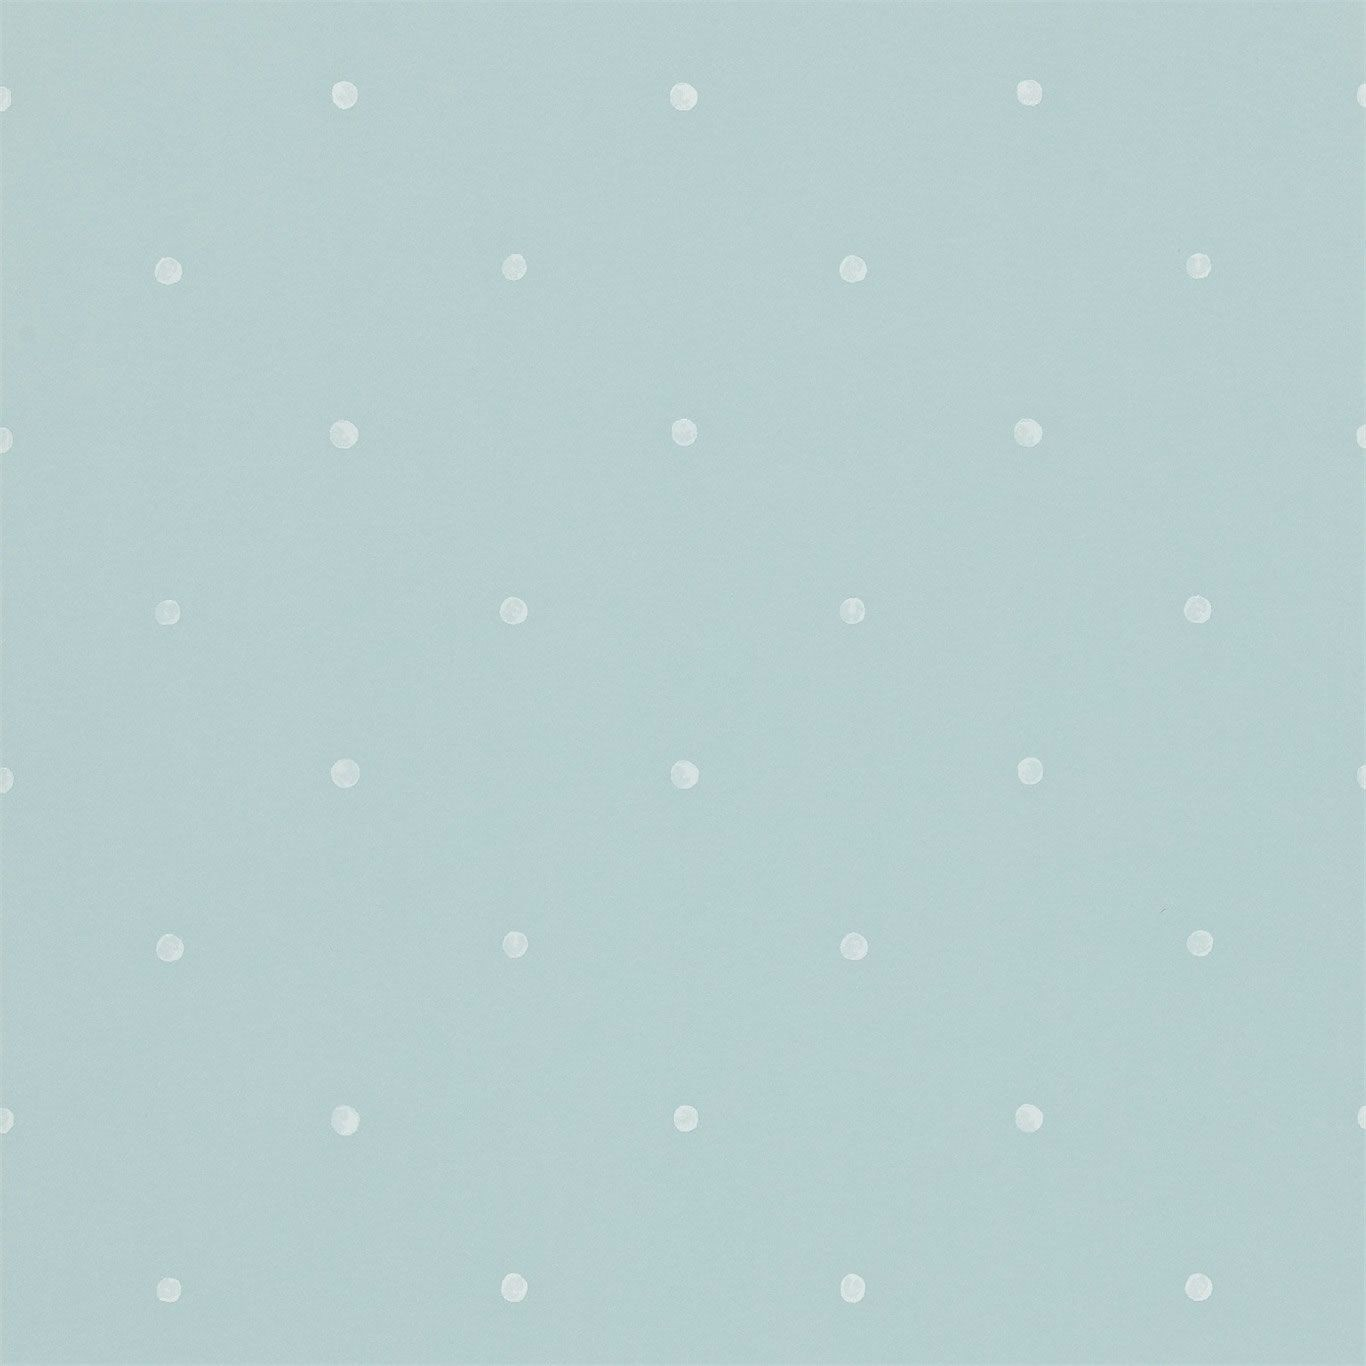 Blue Cream   212846   Polka   Dots   Madison   Sanderson Wallpaper 1366x1366